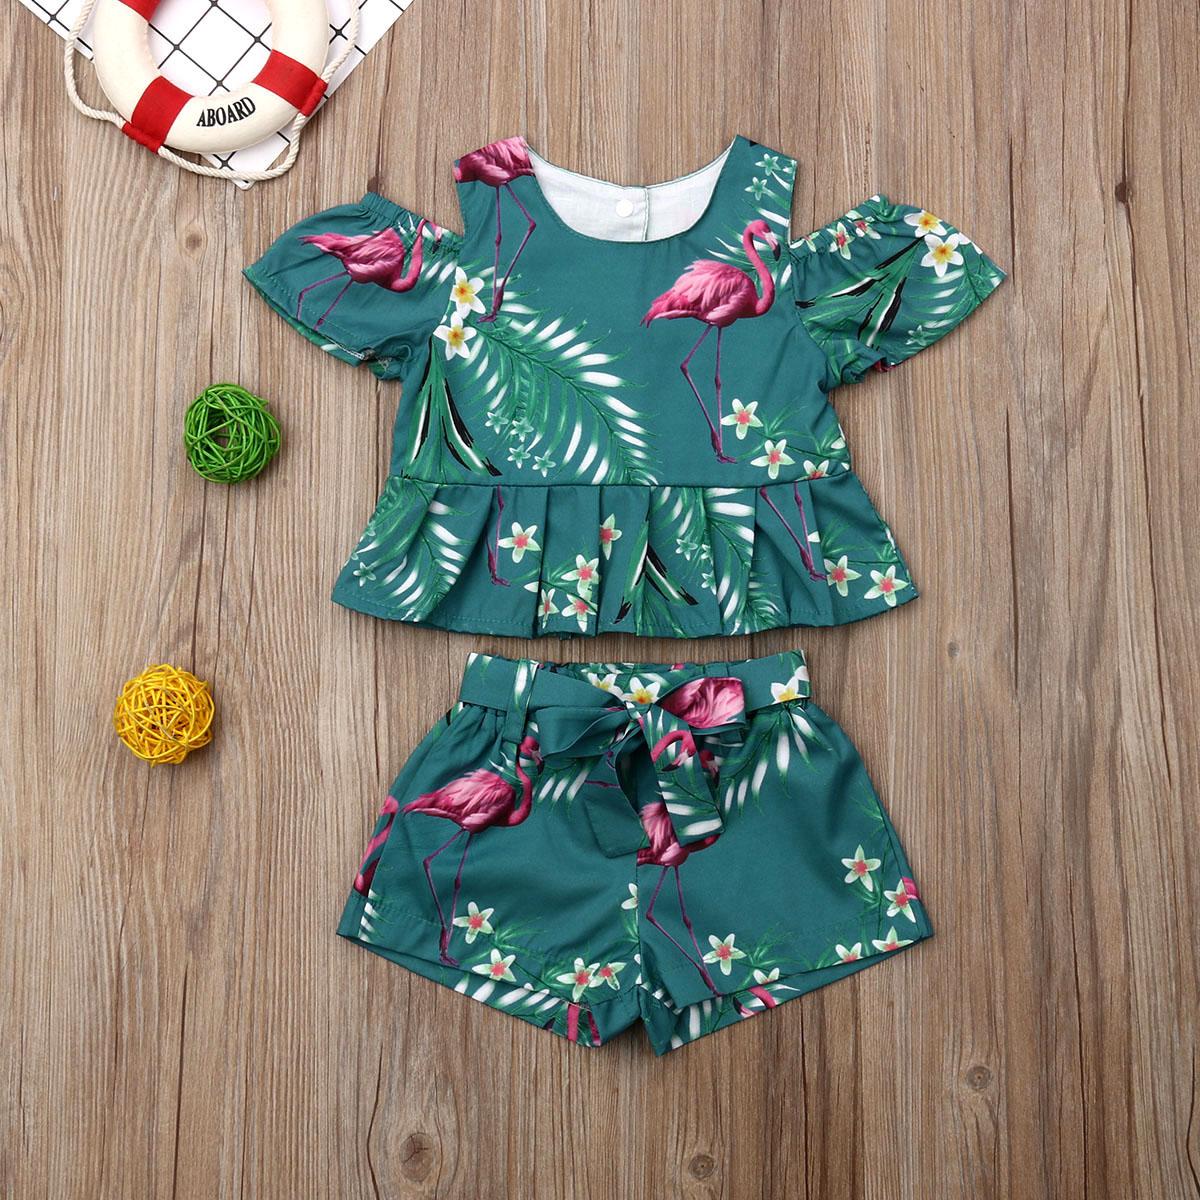 Toddler Baby Girl Clothes Flamingo Print Off Shoulder Ruffle Tops+Short Pants 2pcs Outfits Summer